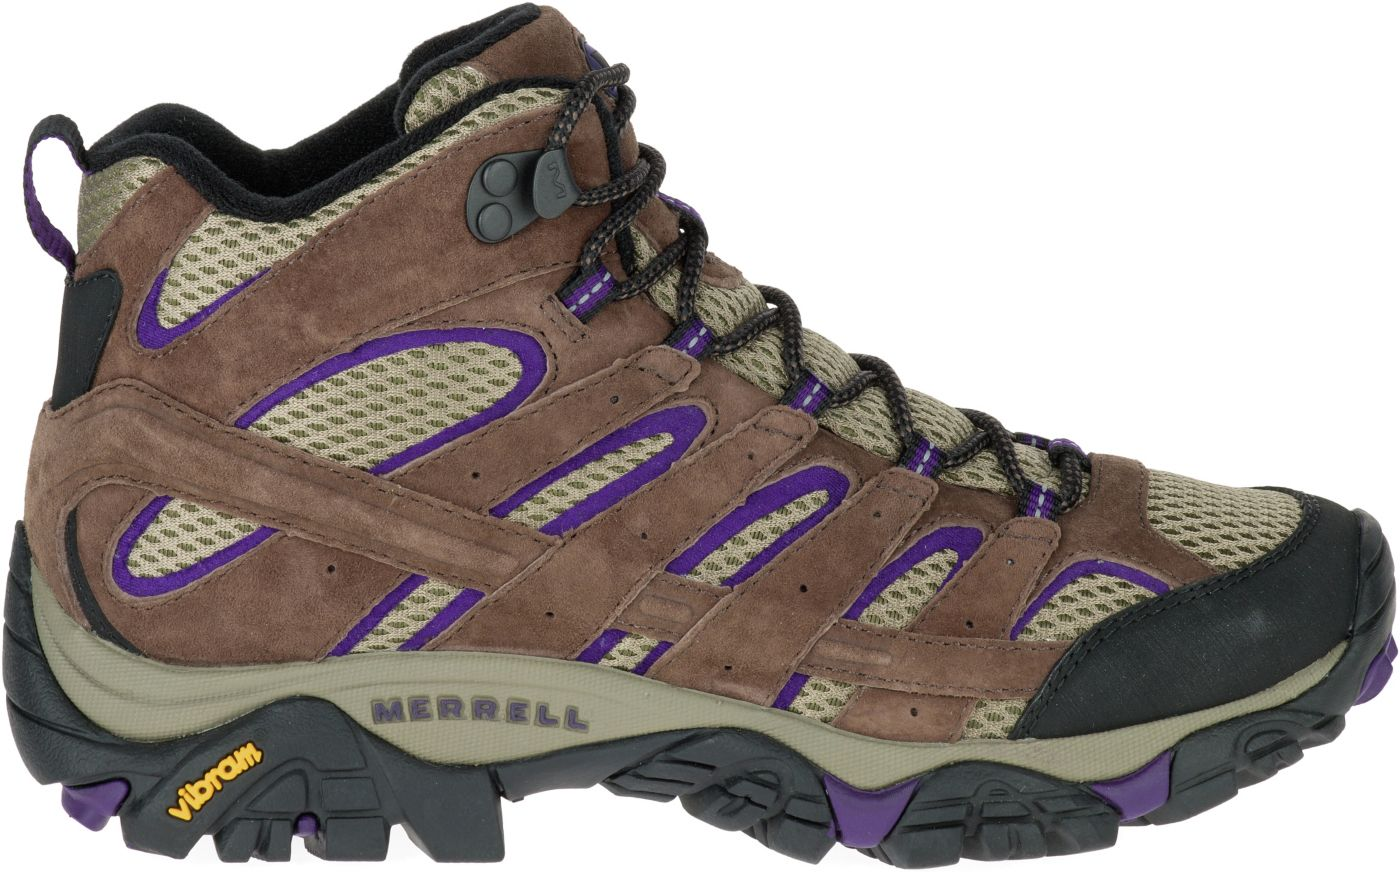 Merrell Women's Moab 2 Ventilator Mid Hiking Boots